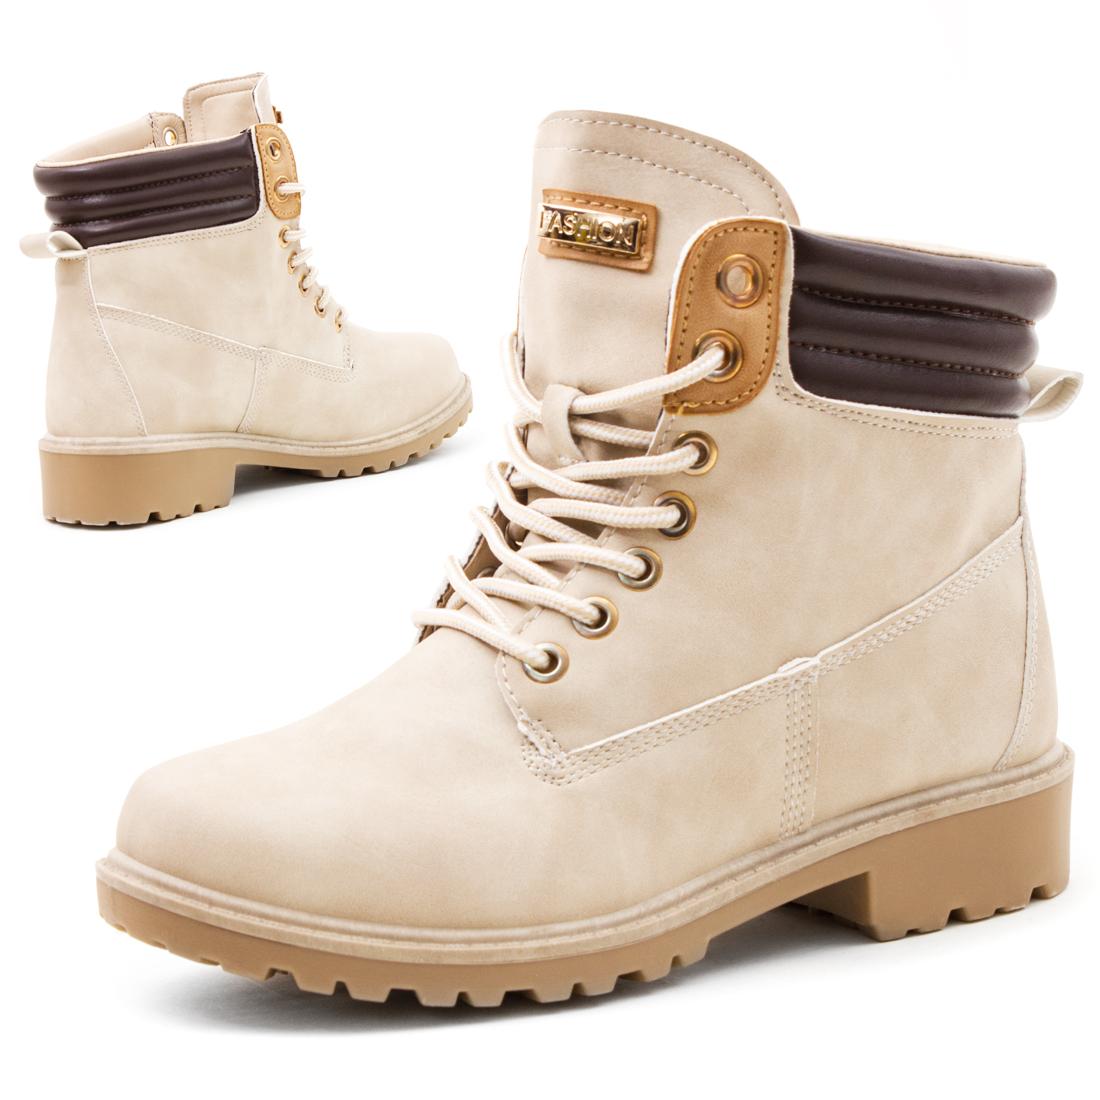 damen boots stiefeletten winterstiefel schn rschuhe in. Black Bedroom Furniture Sets. Home Design Ideas